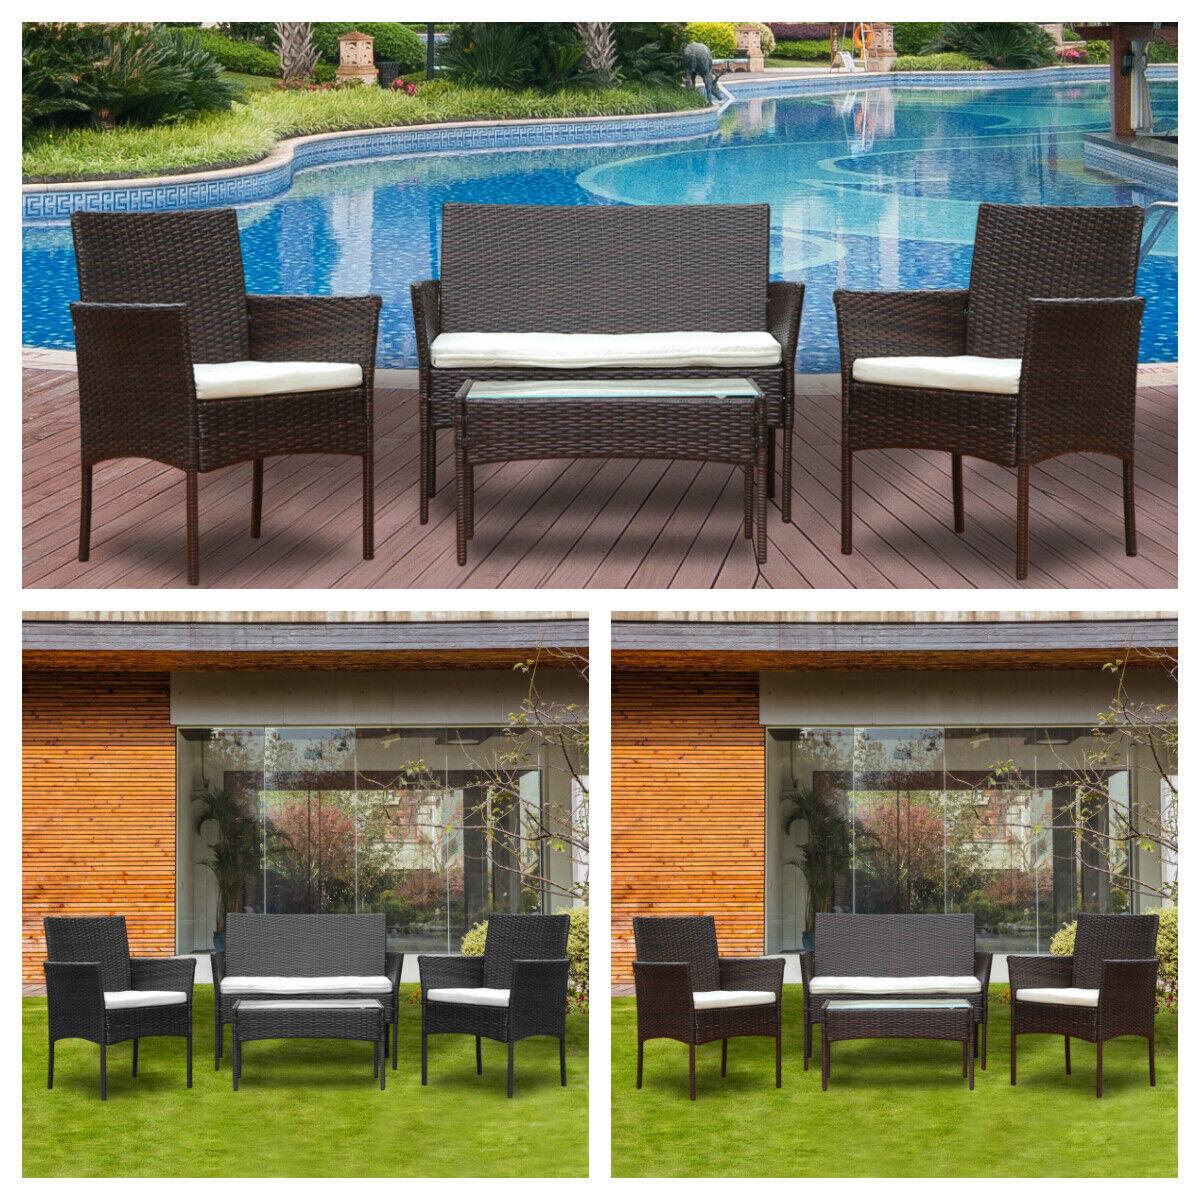 Garden Furniture - Patio 4 PCS Wicker Furniture Outdoor Rattan Sofa Table Garden Conversation Set